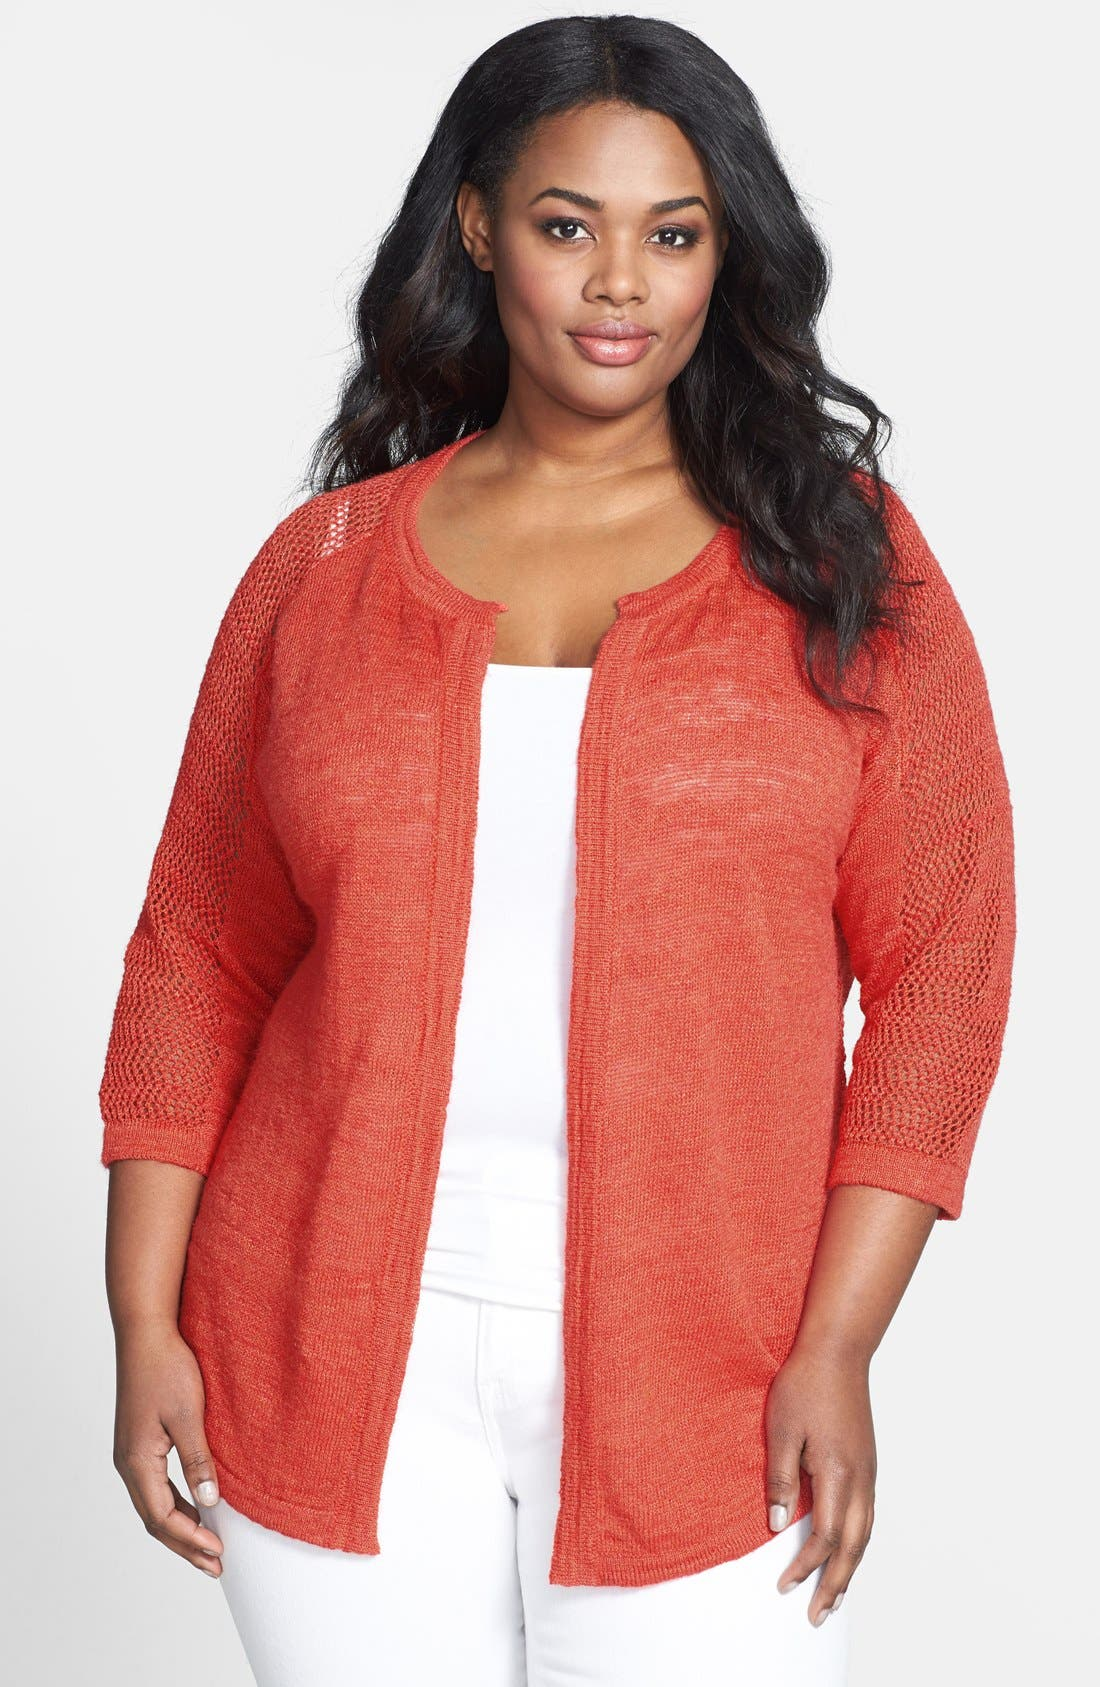 Alternate Image 1 Selected - Lucky Brand 'Monrovia' Pointelle Cardigan (Plus Size)